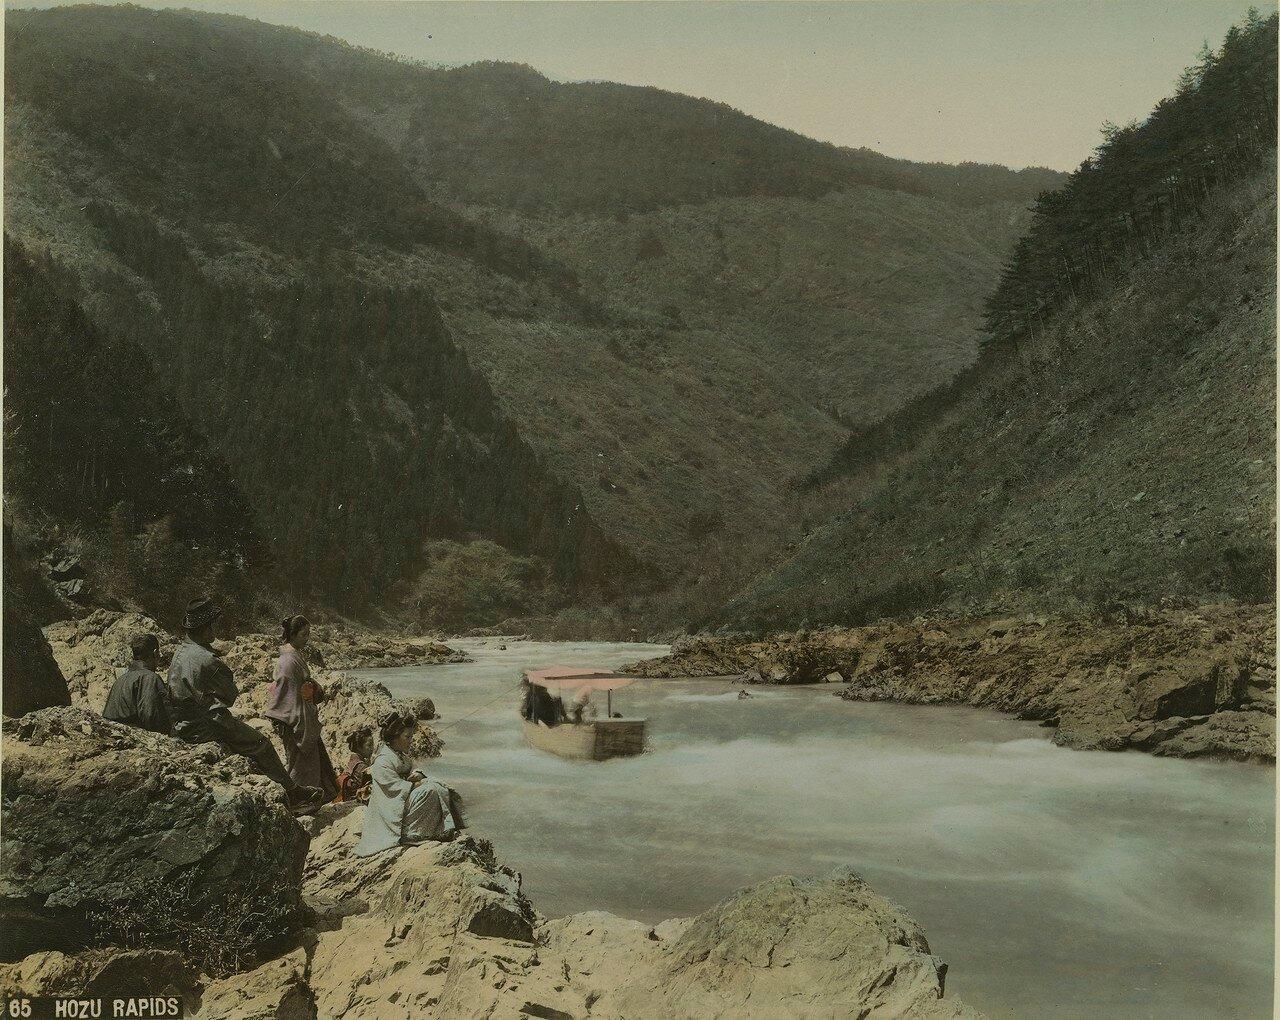 Река Хозу. Стремнина